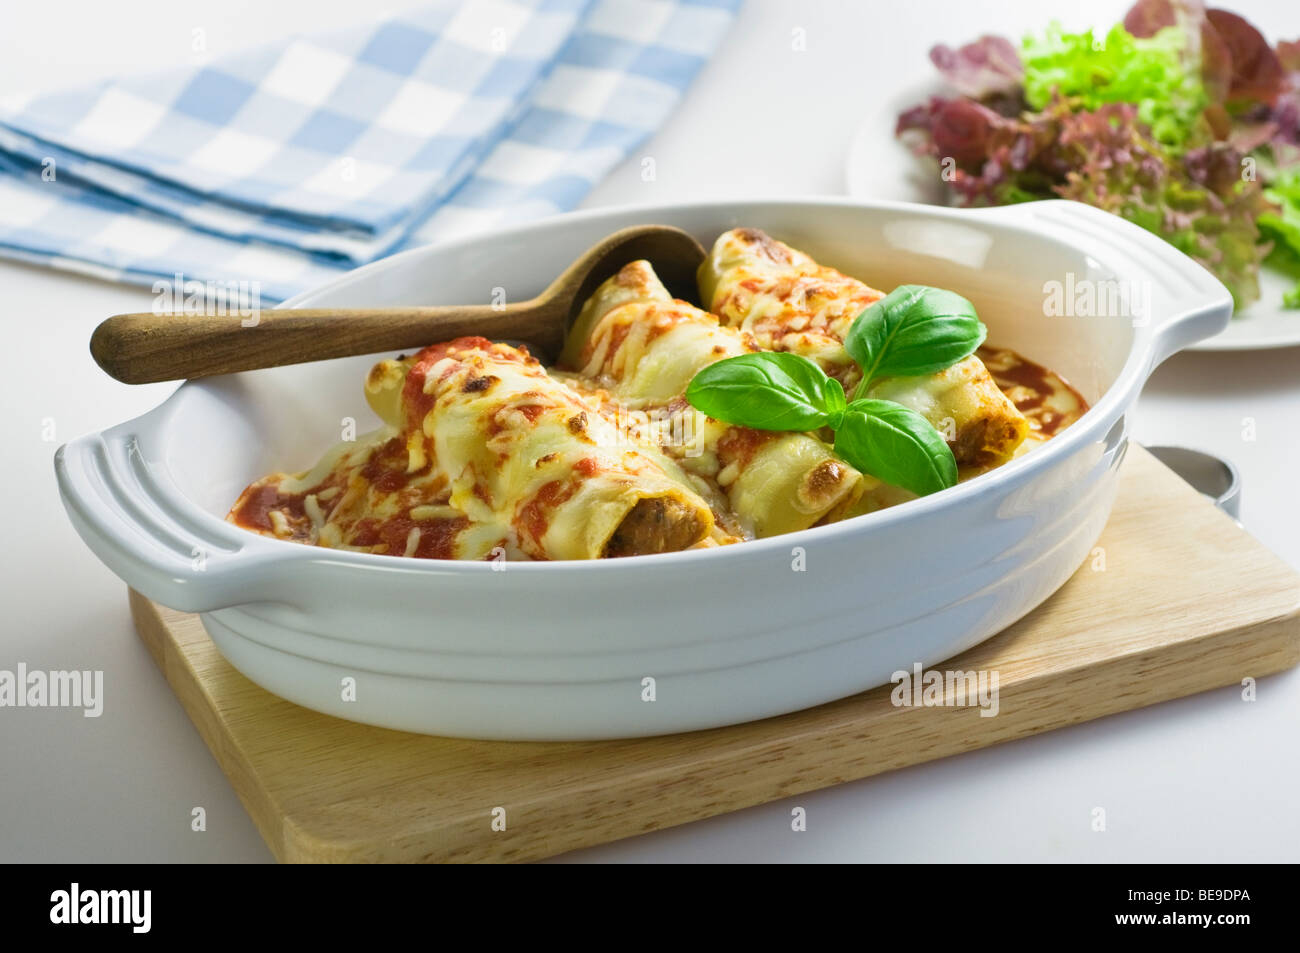 Cuisine Italienne Italie Cannelloni Photo Stock